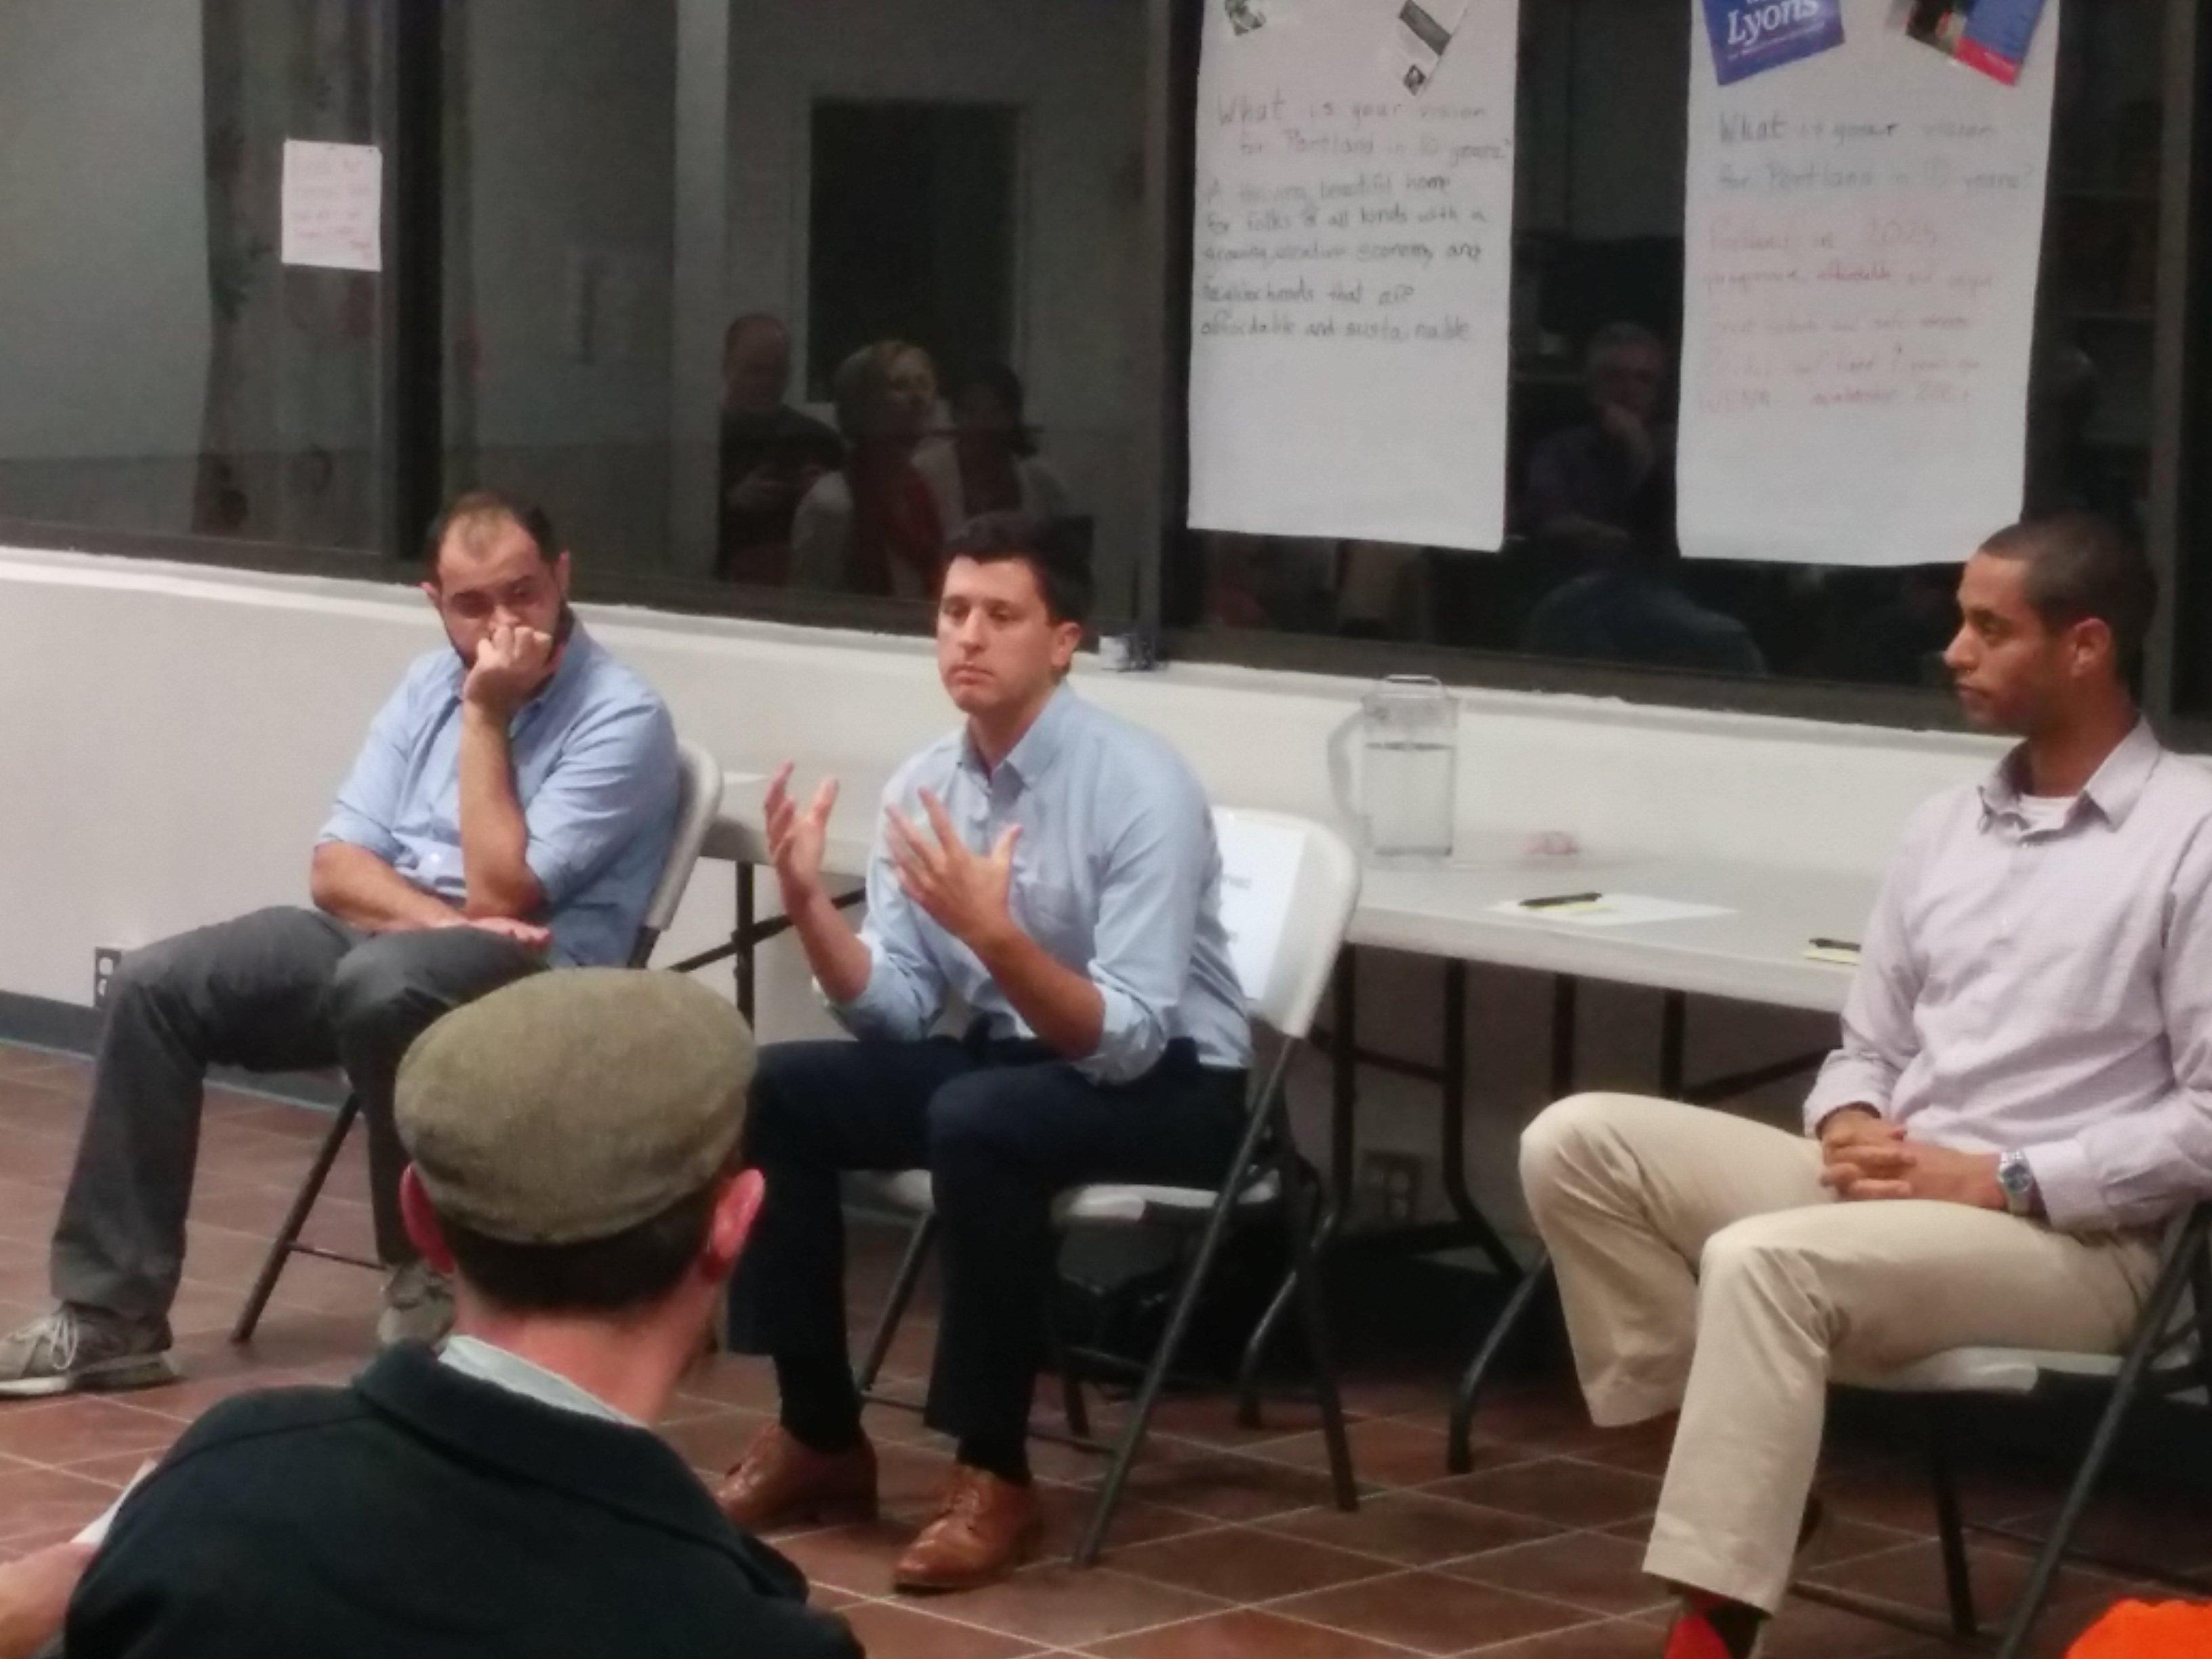 WENA and WPNA's Candidates Forum